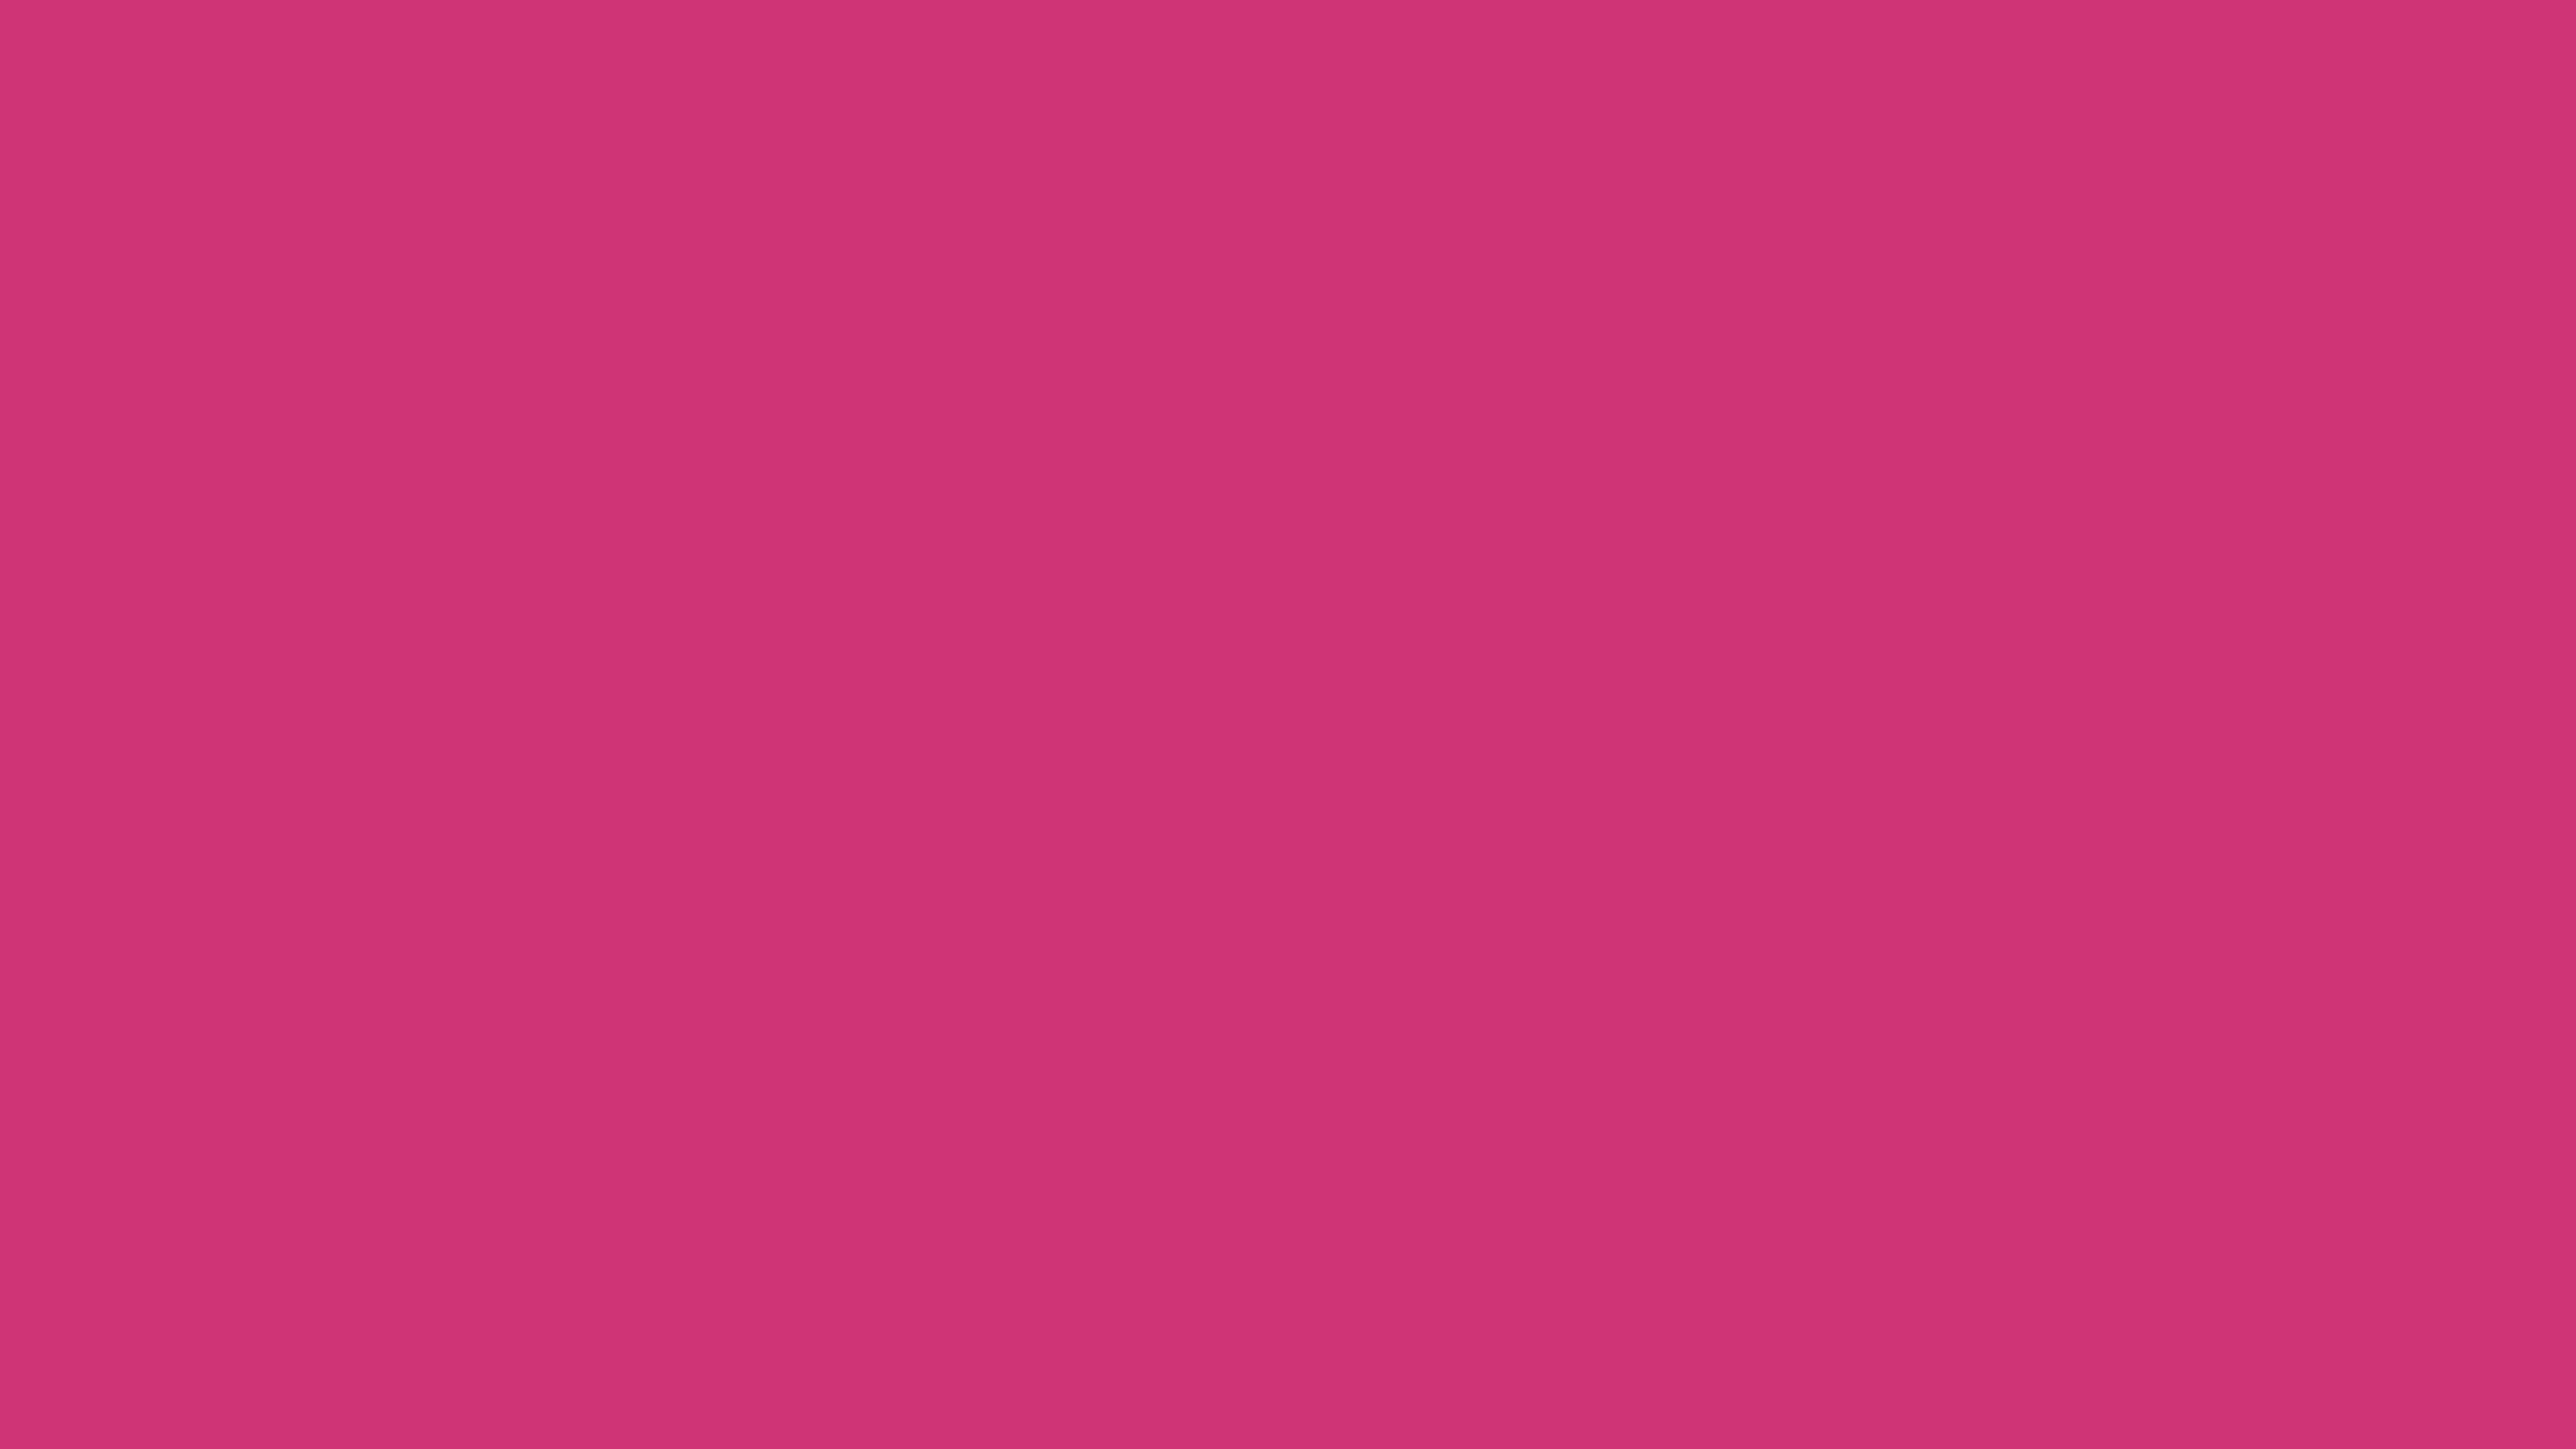 3840x2160 Telemagenta Solid Color Background